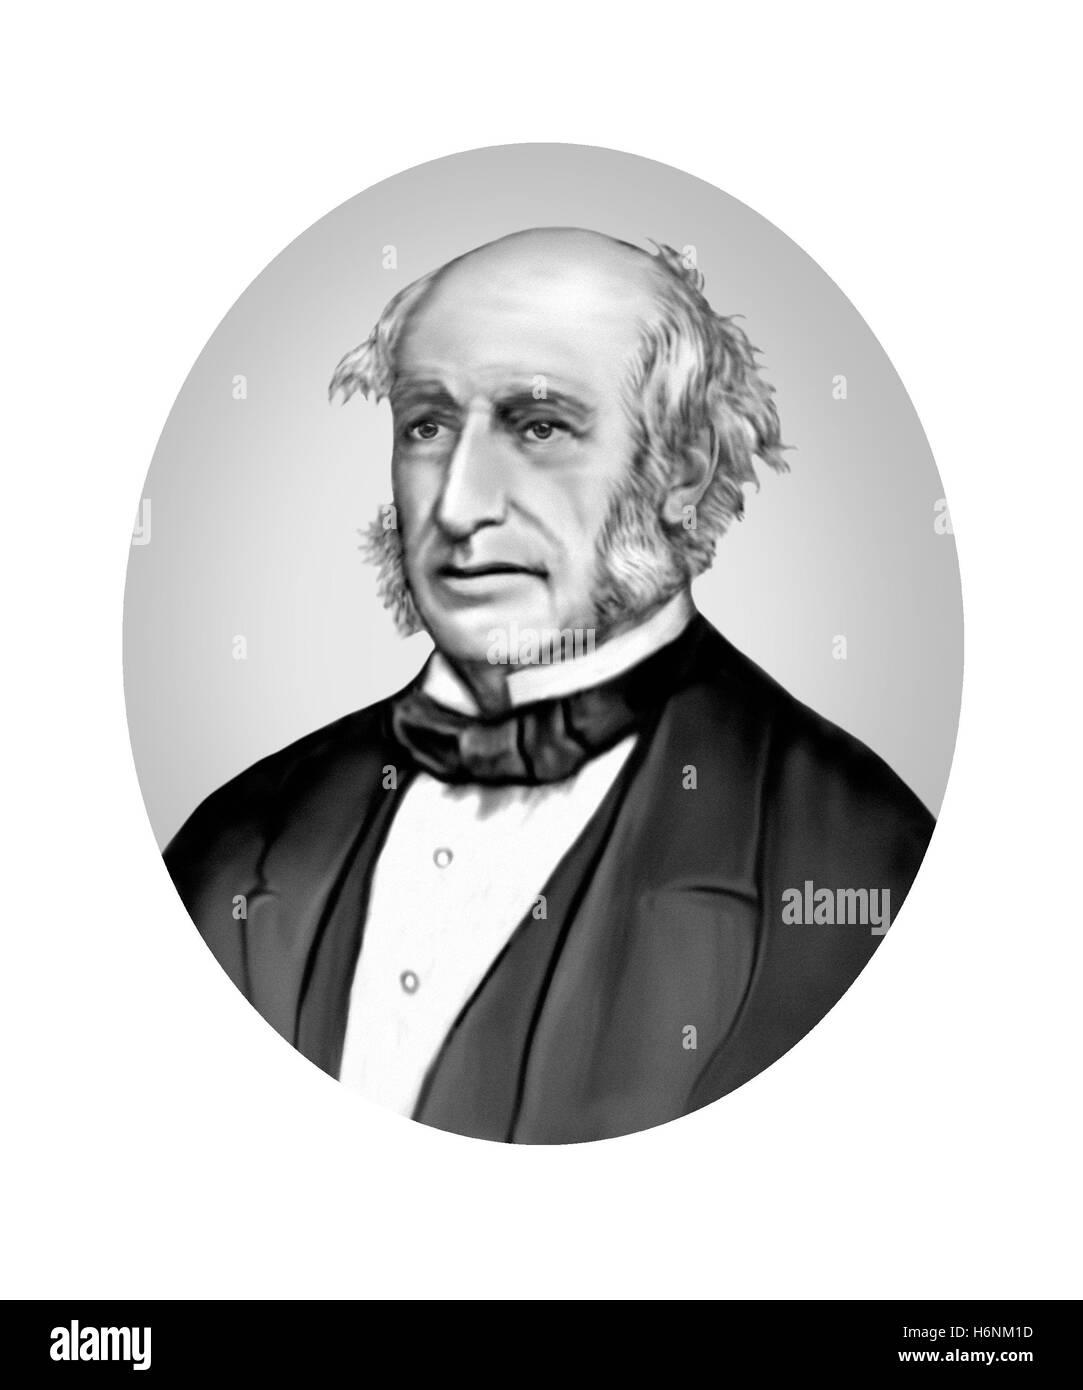 William Hilton Hovell, 1786-1875, Explorer - Stock Image